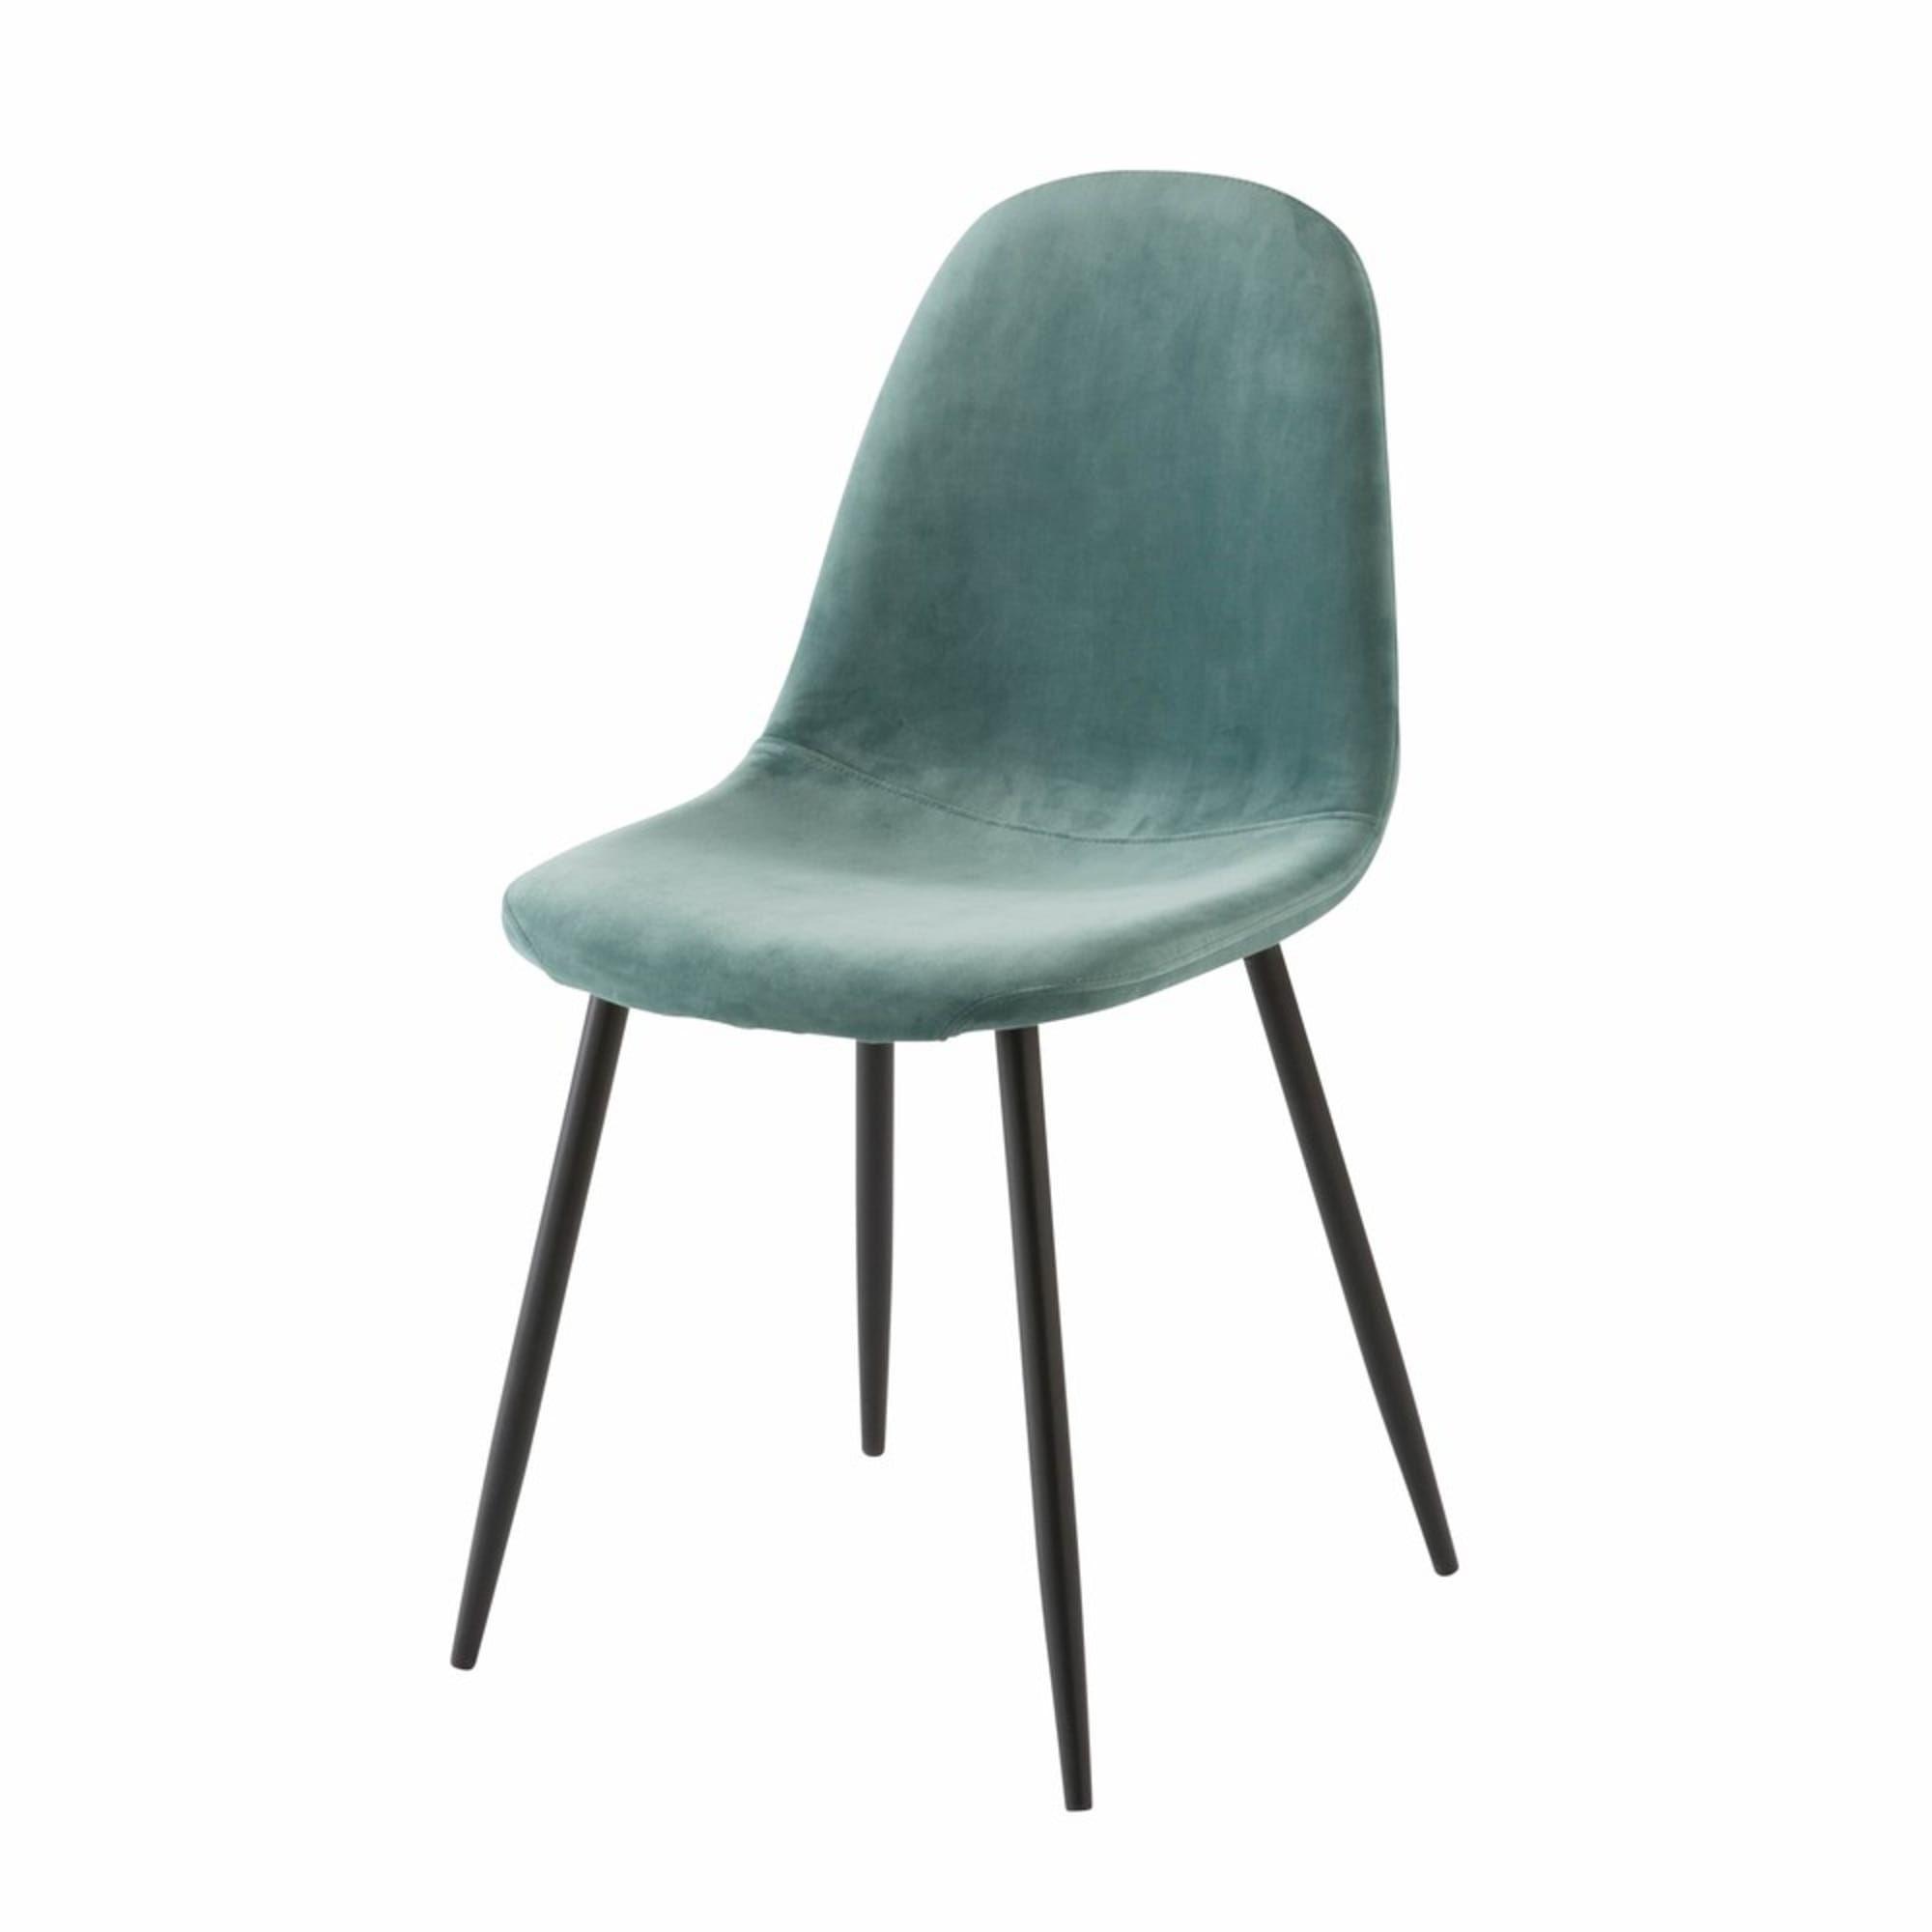 Skandinavischer Stuhl Altrosa Samtbezug In 2020 Skandinavische Stuhle Stuhle Und Skandinavische Esszimmerstuhle